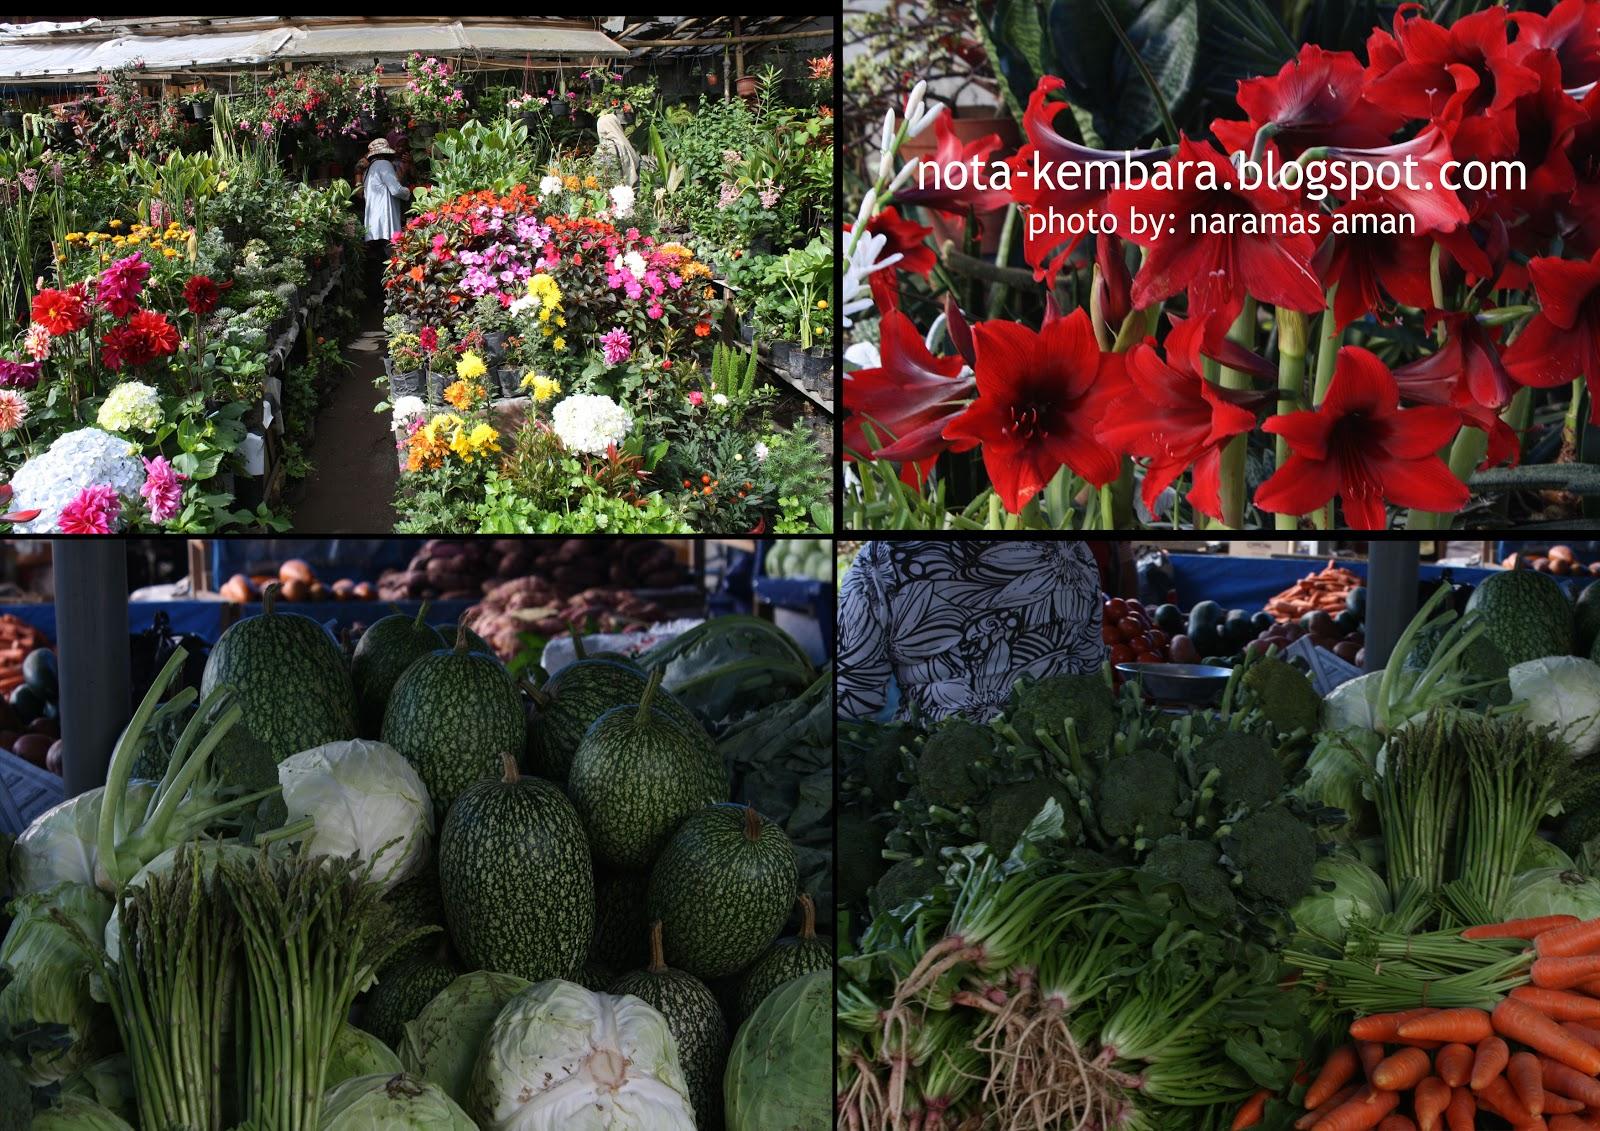 Berastagi  3  Shopping Buahbuahan dan Sayursayuran Segar